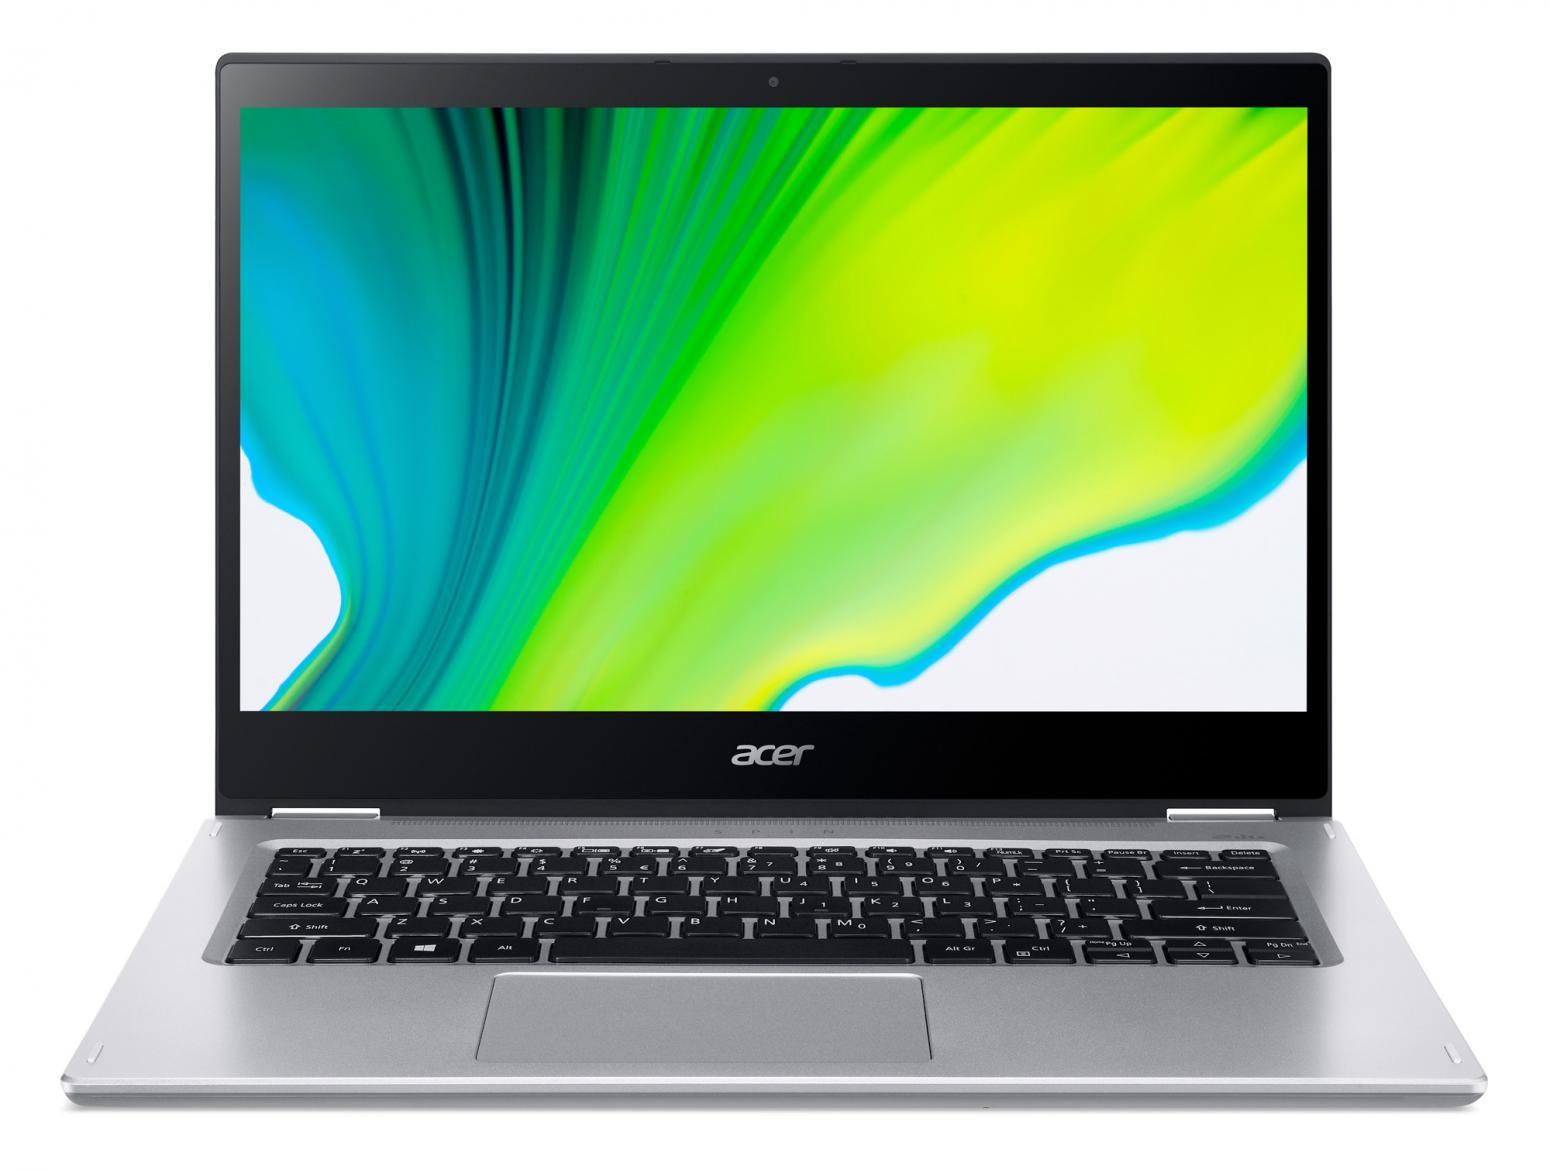 Ordinateur portable Acer Spin 3 SP314-54N-52H9 Argent - Tactile, Stylet - photo 3